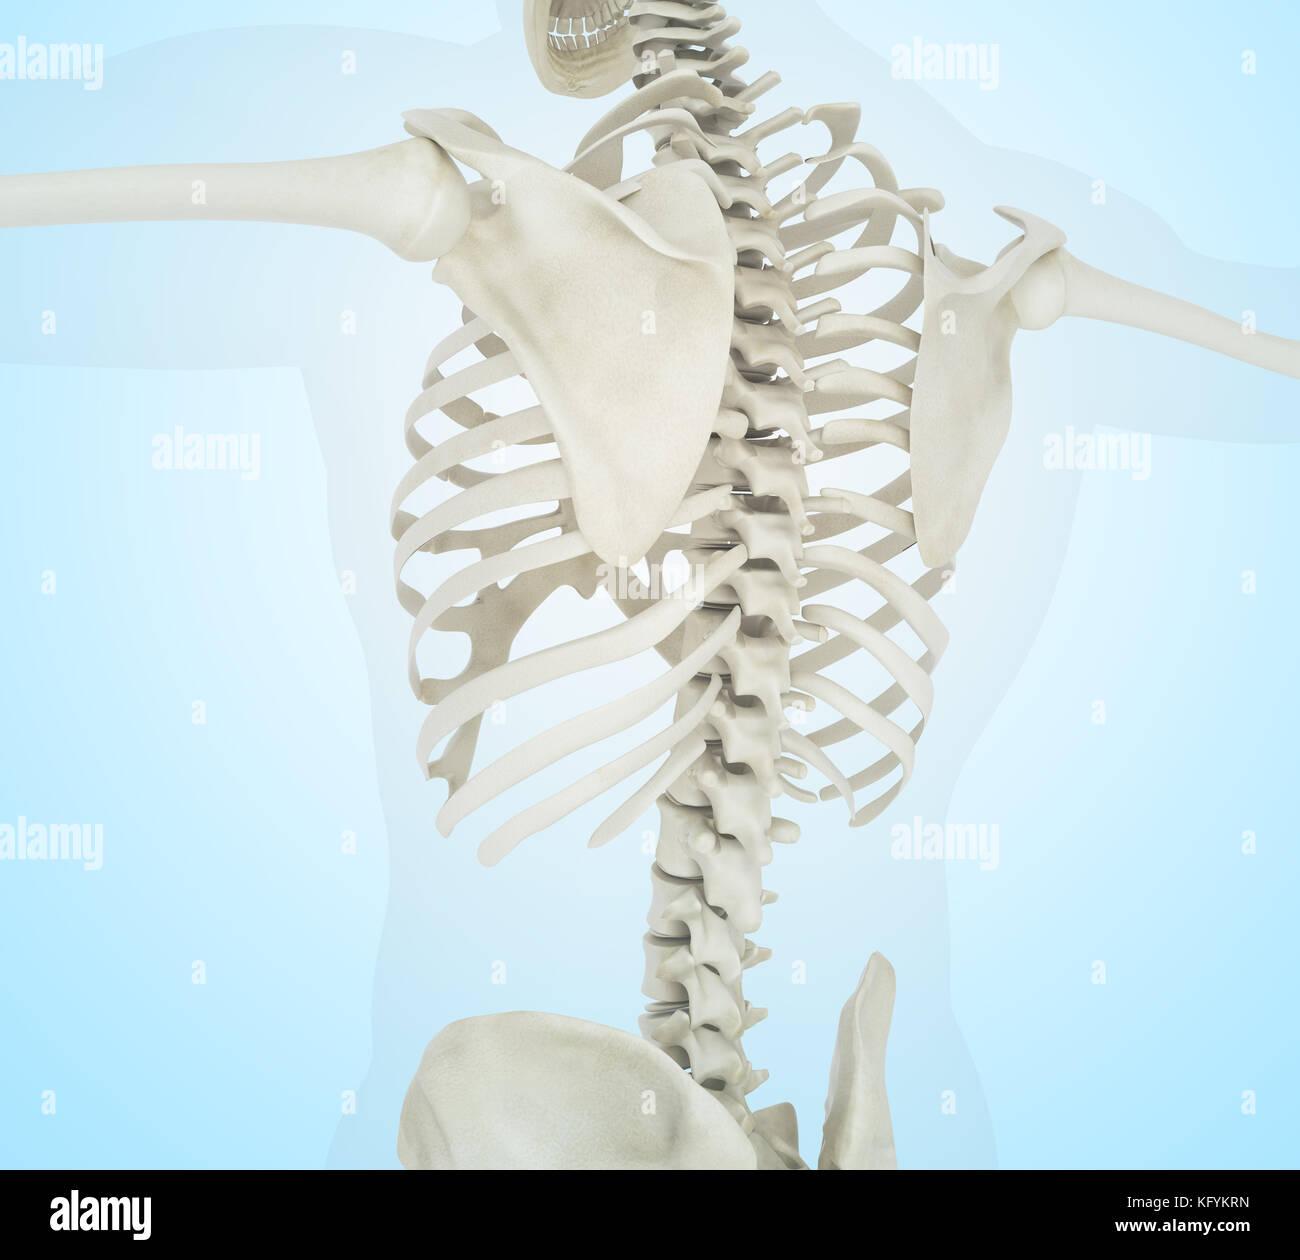 Human Skeleton Neck Spine Vertebra Stockfotos & Human Skeleton Neck ...